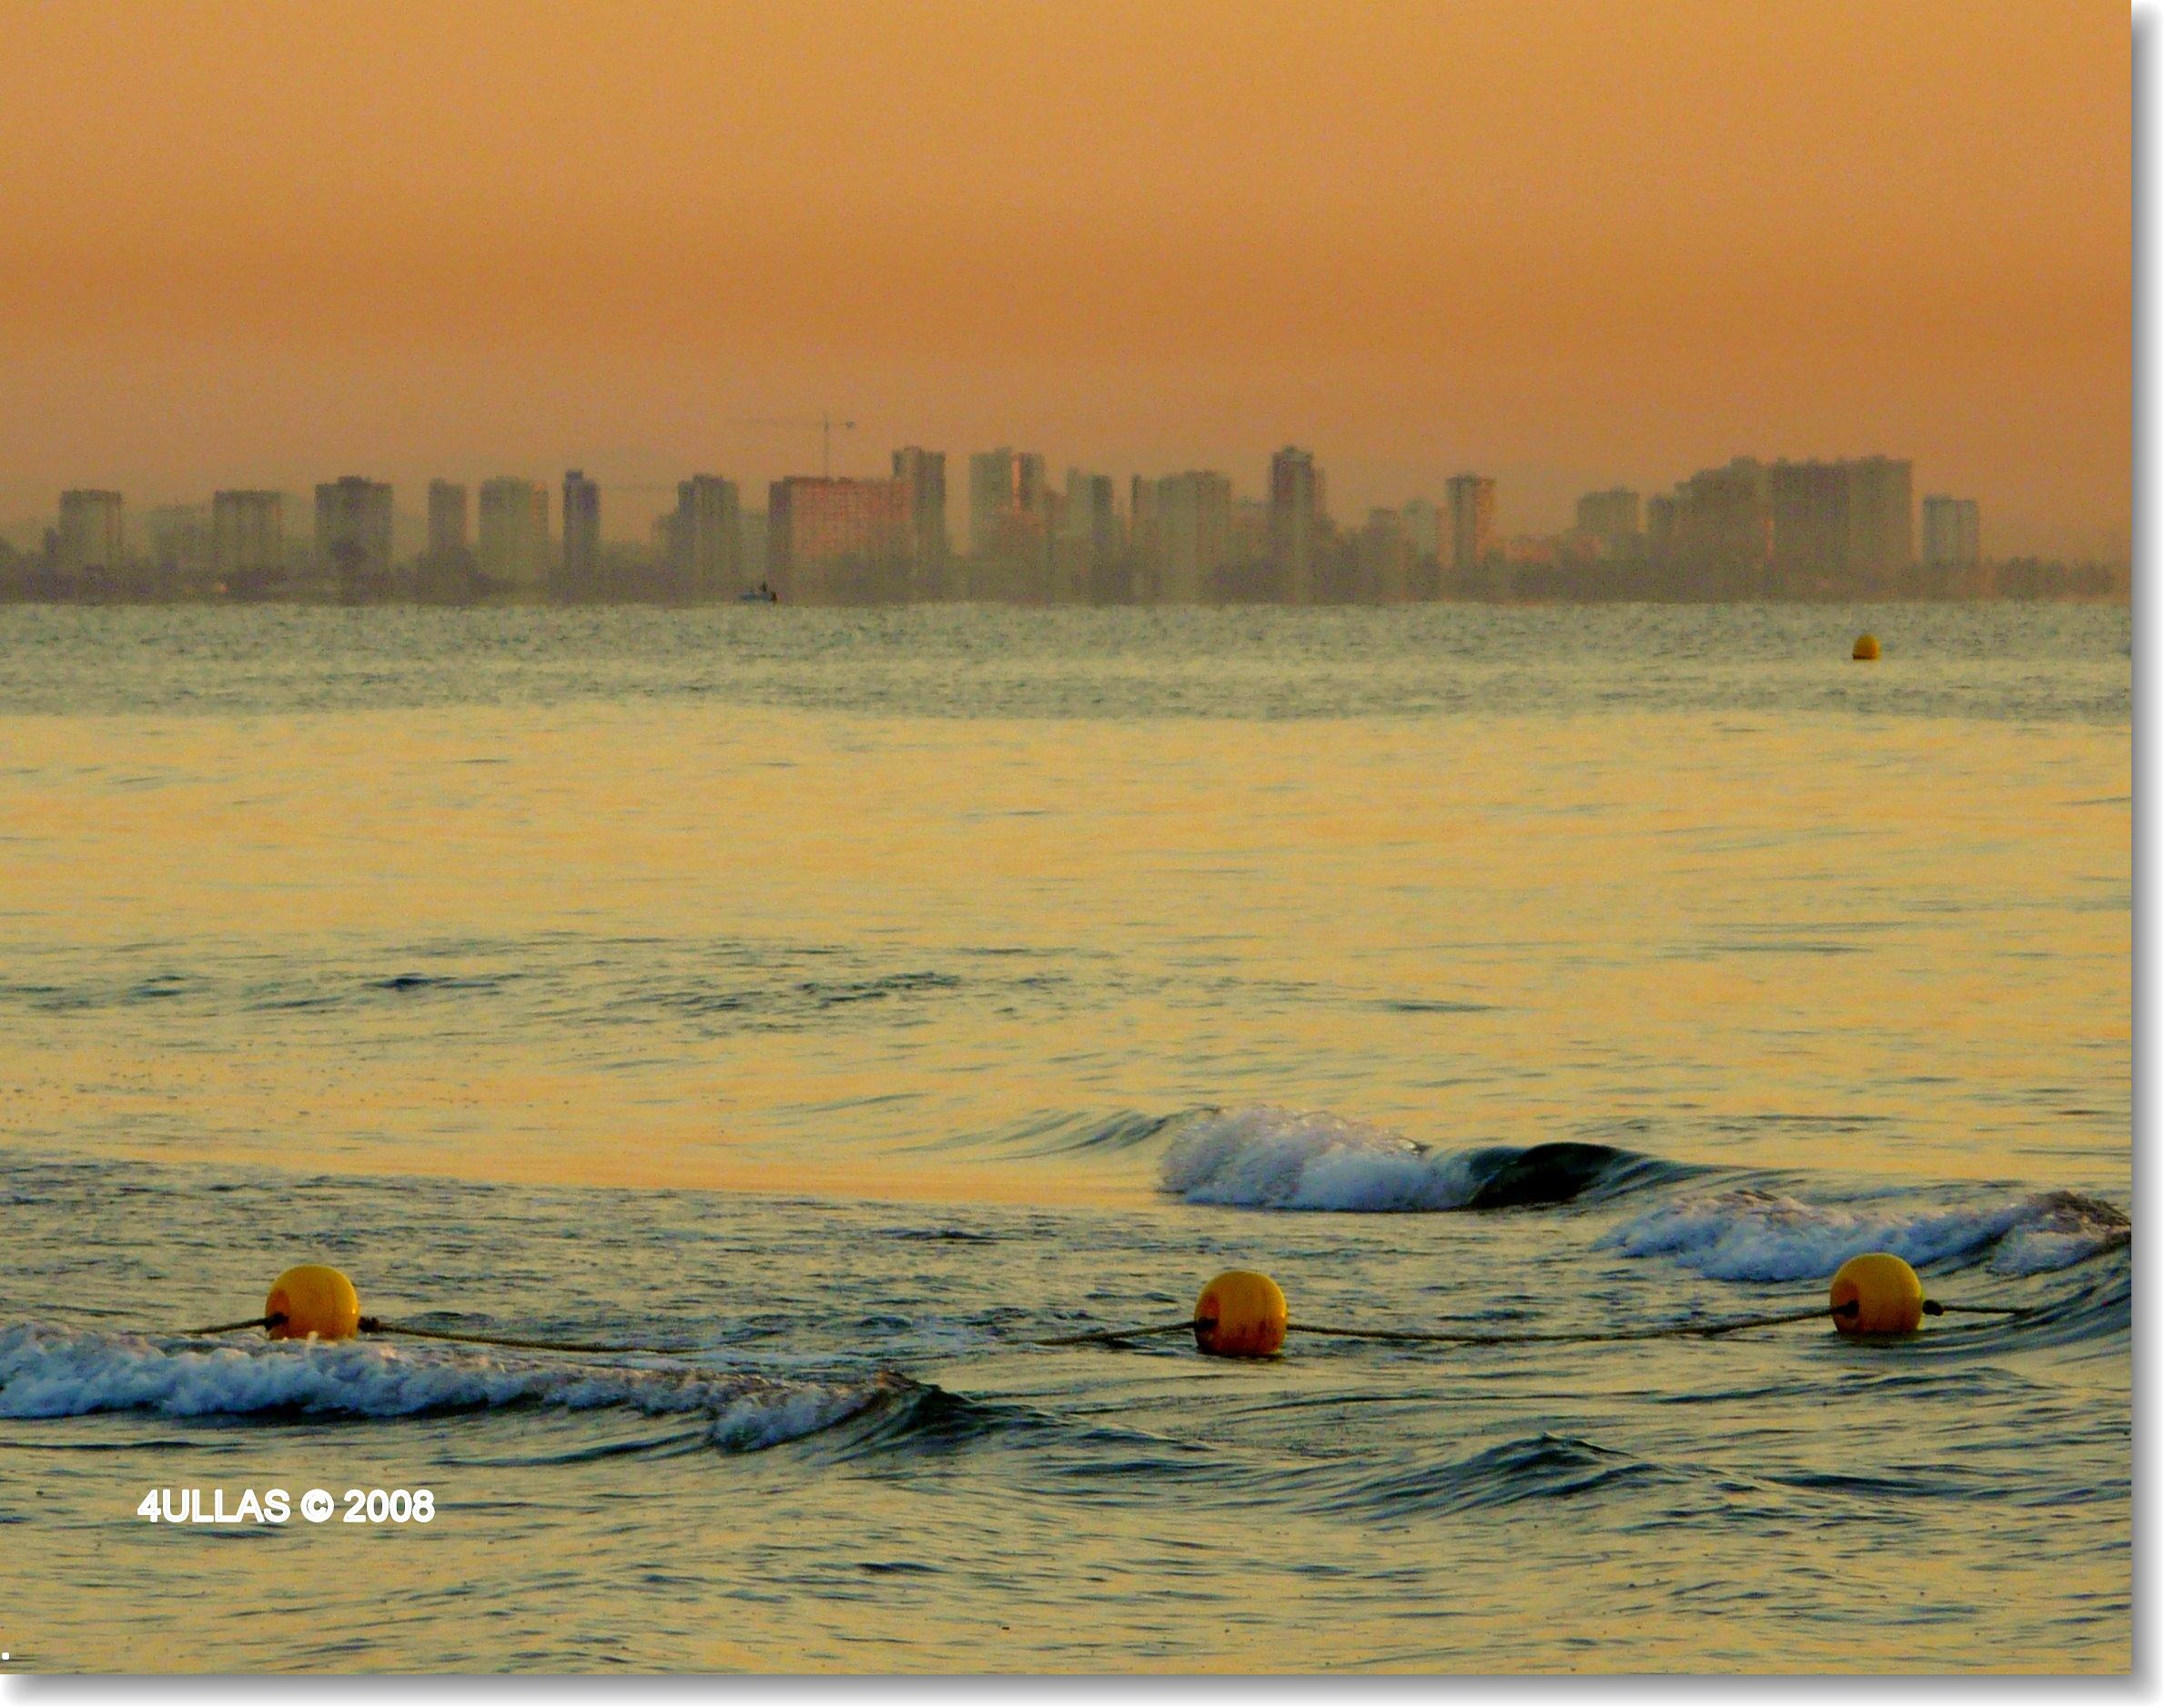 Foto playa Las Arenas. Valencia´s malvarrosa beach at sunrise light: Sorolla´s paintings scenario.